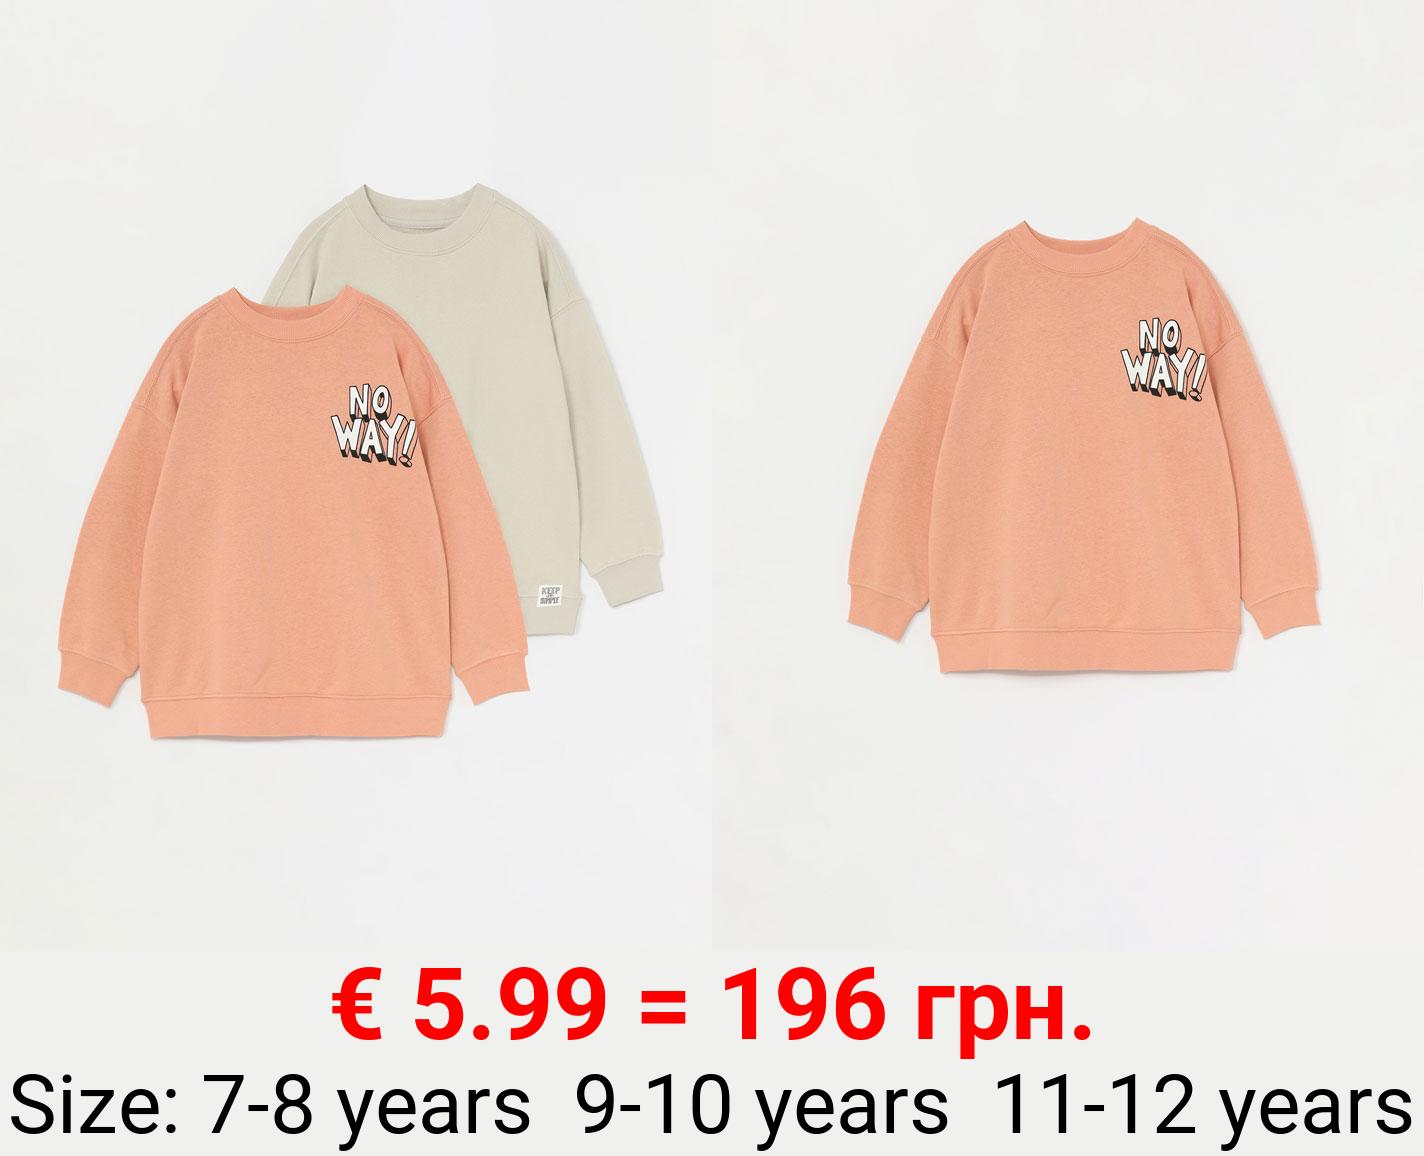 2-pack of plain and printed sweatshirts